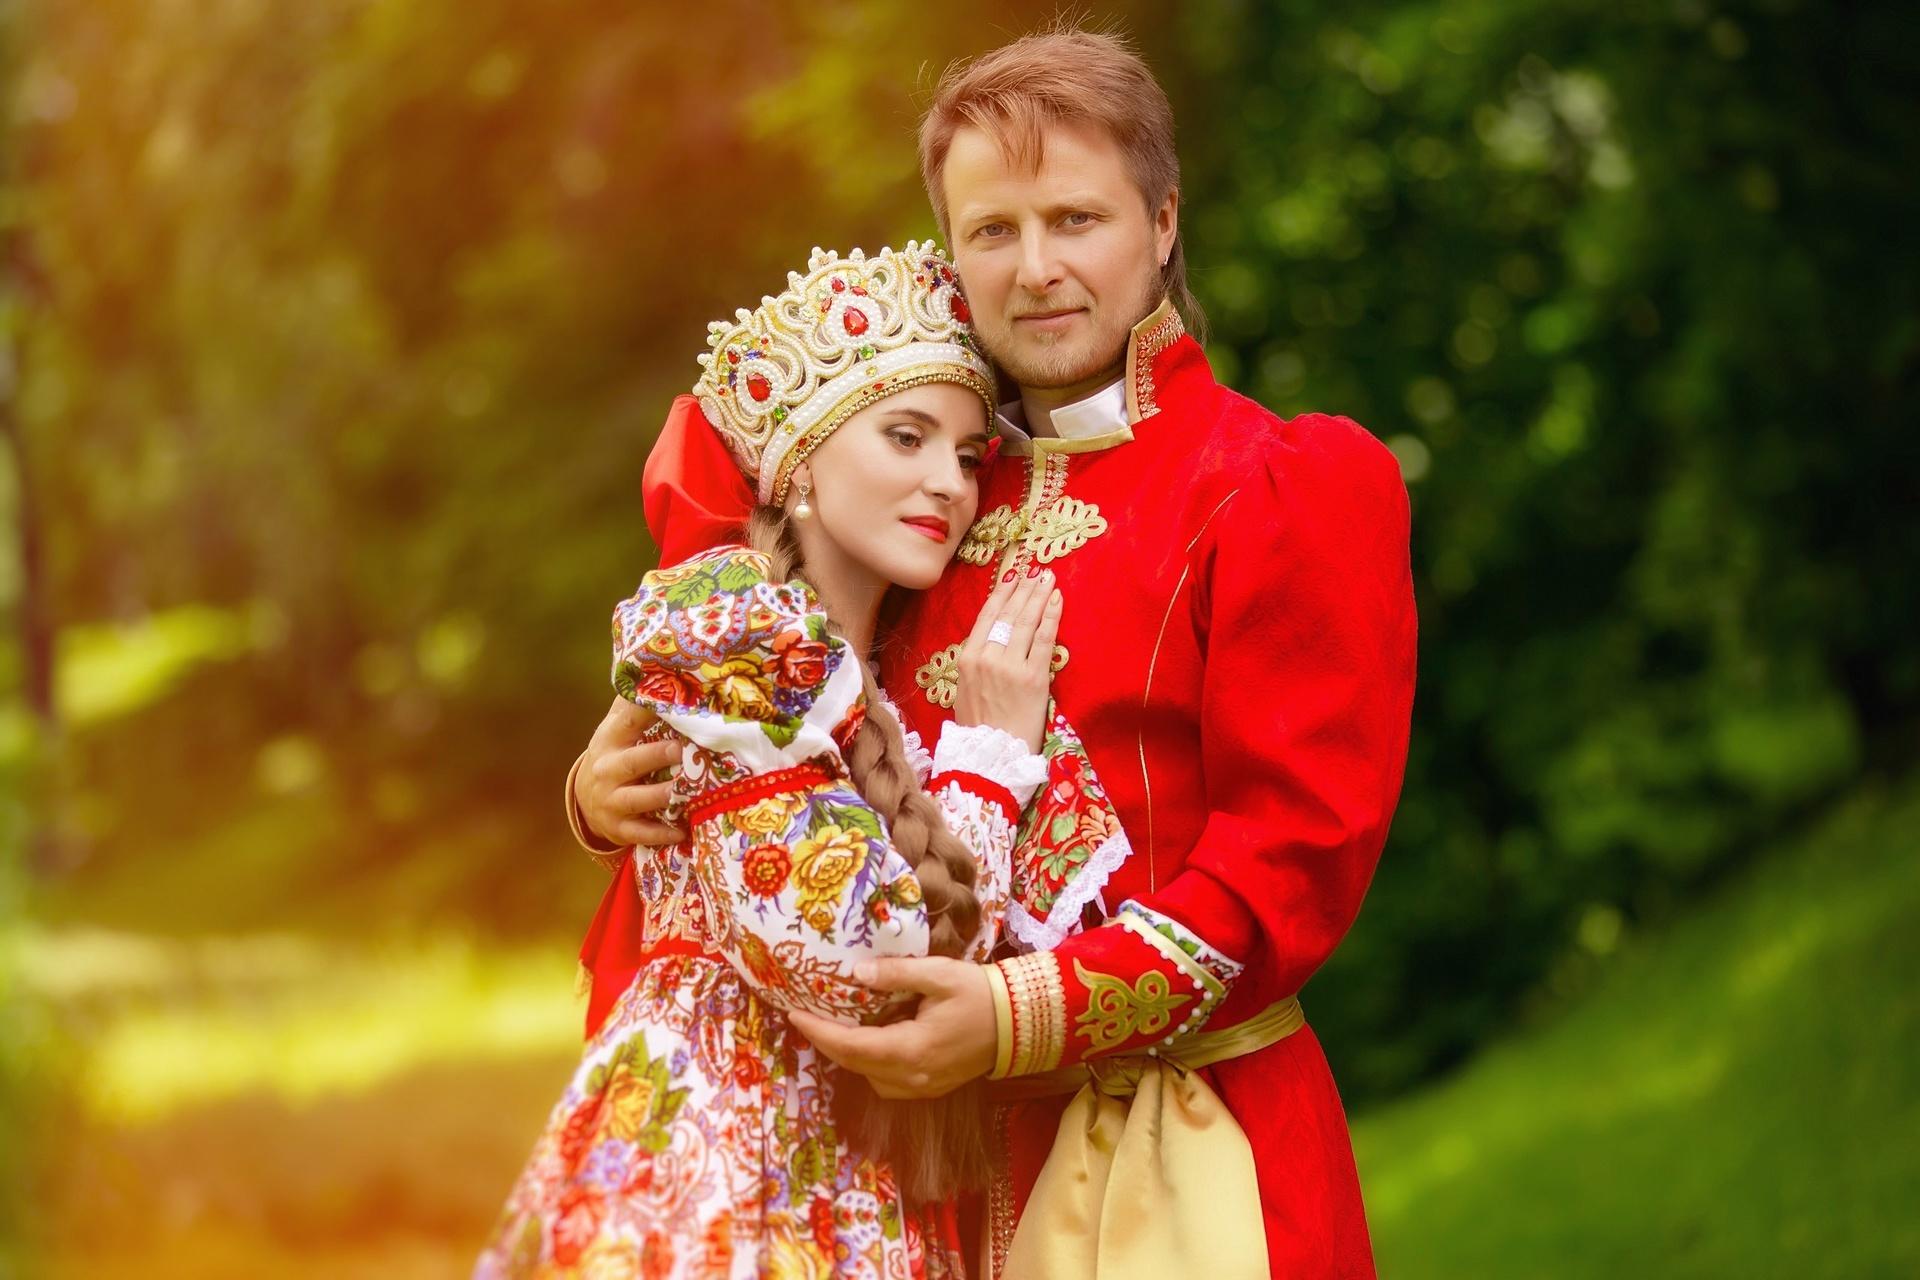 Русские пословицы про жениха и невесту на Руси